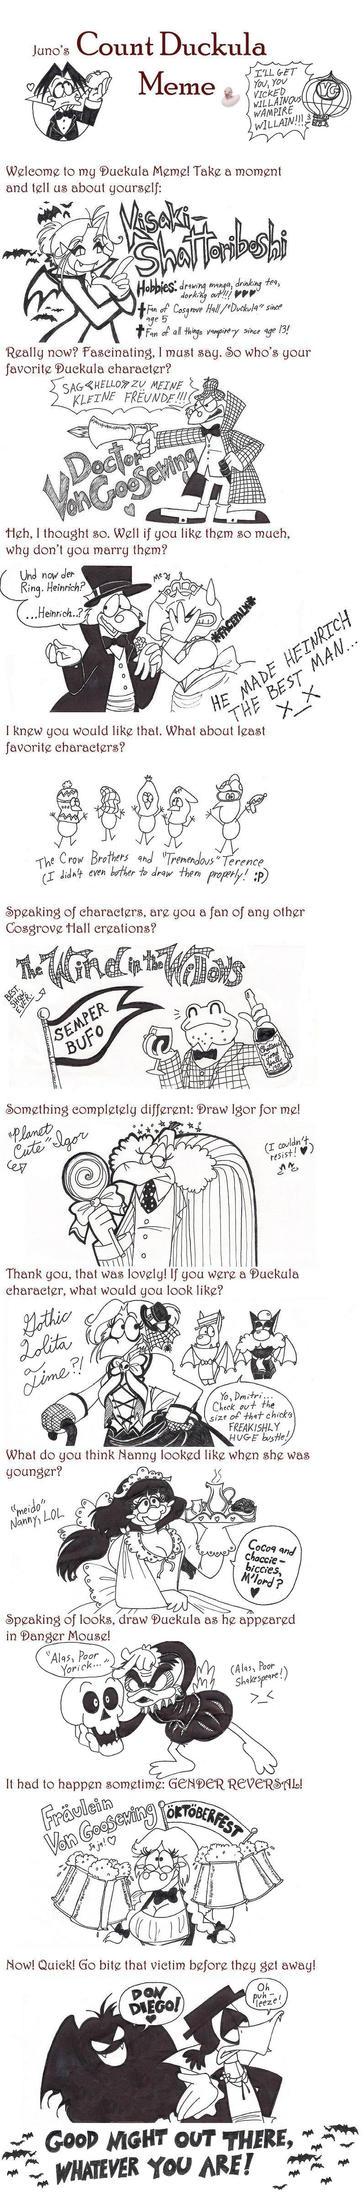 Count Duckula Meme by Kisaki-Shattoriboshi